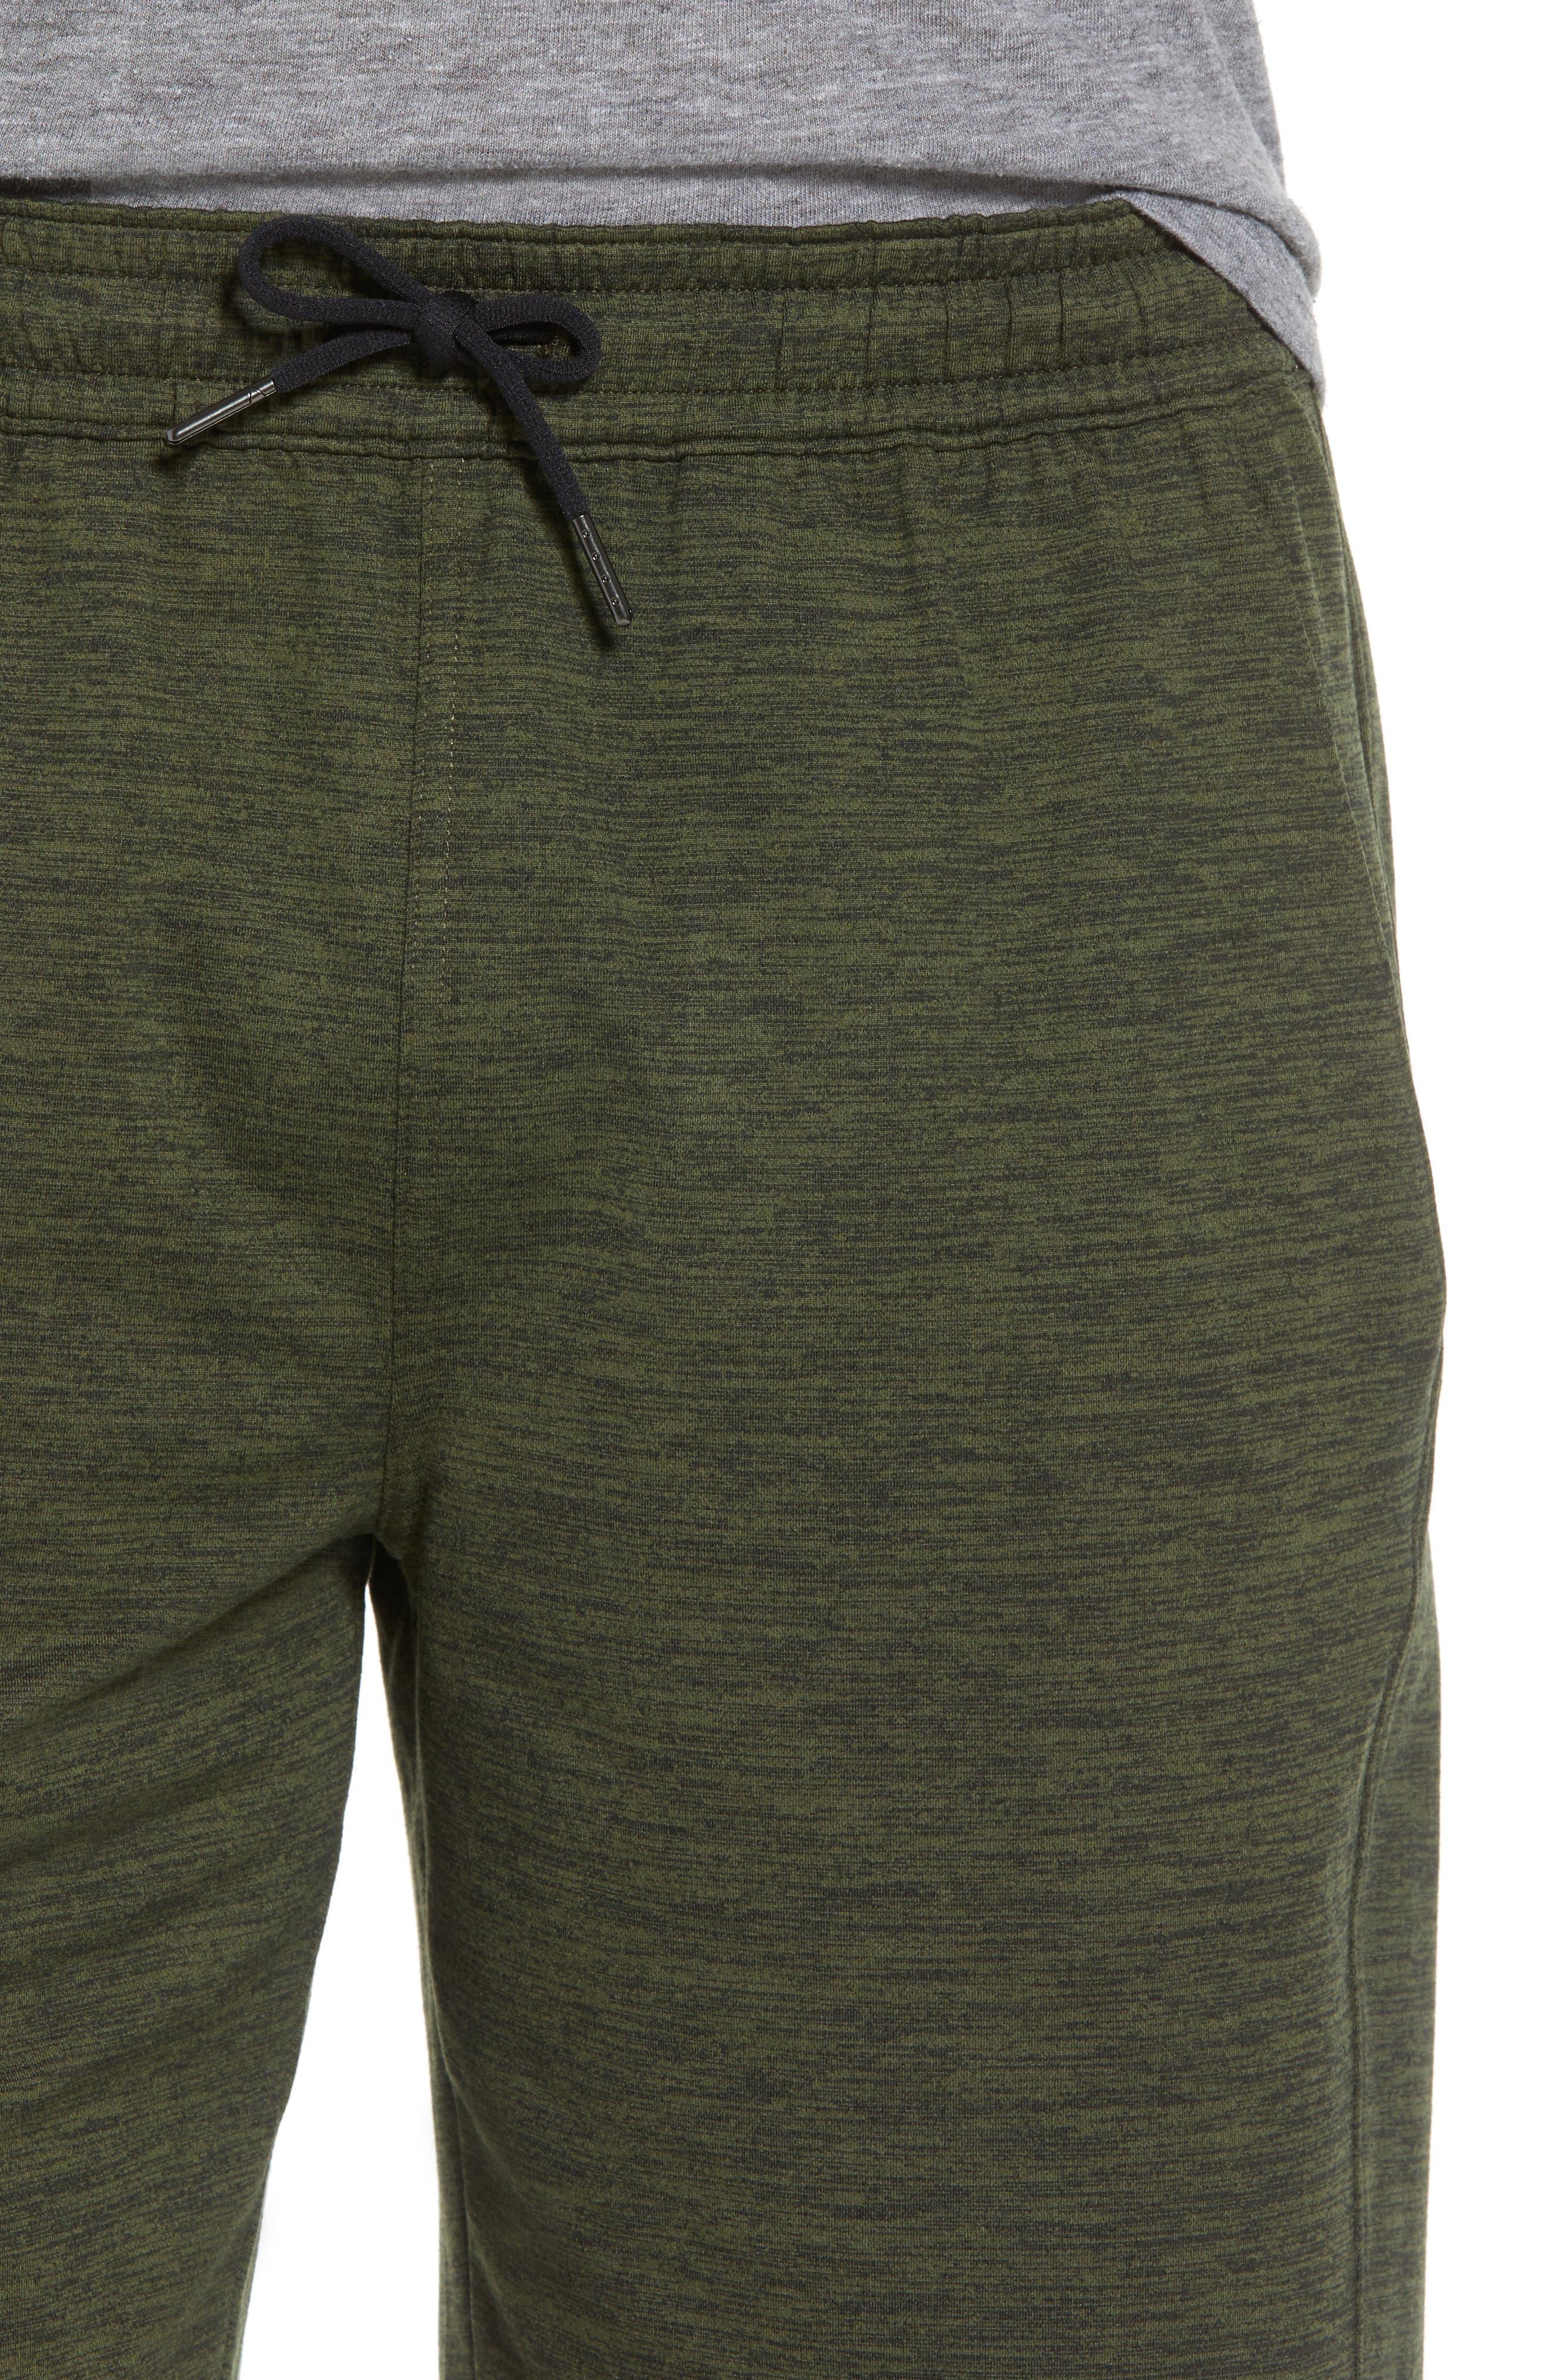 Pyrite Knit Shorts,                             Alternate thumbnail 14, color,